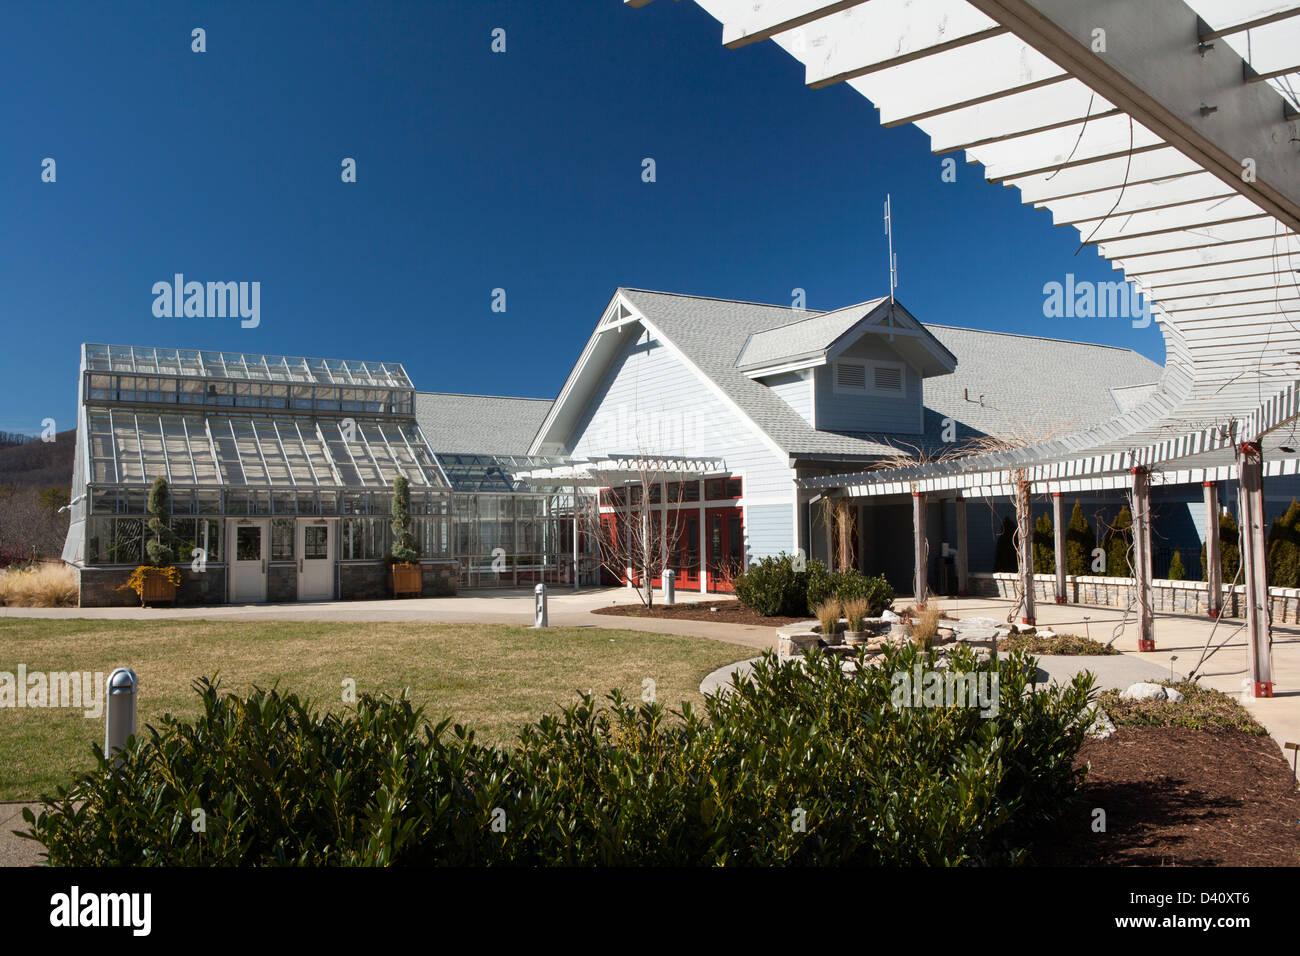 Visitor's Center at the North Carolina Arboretum - Asheville, North Carolina USA Stock Photo